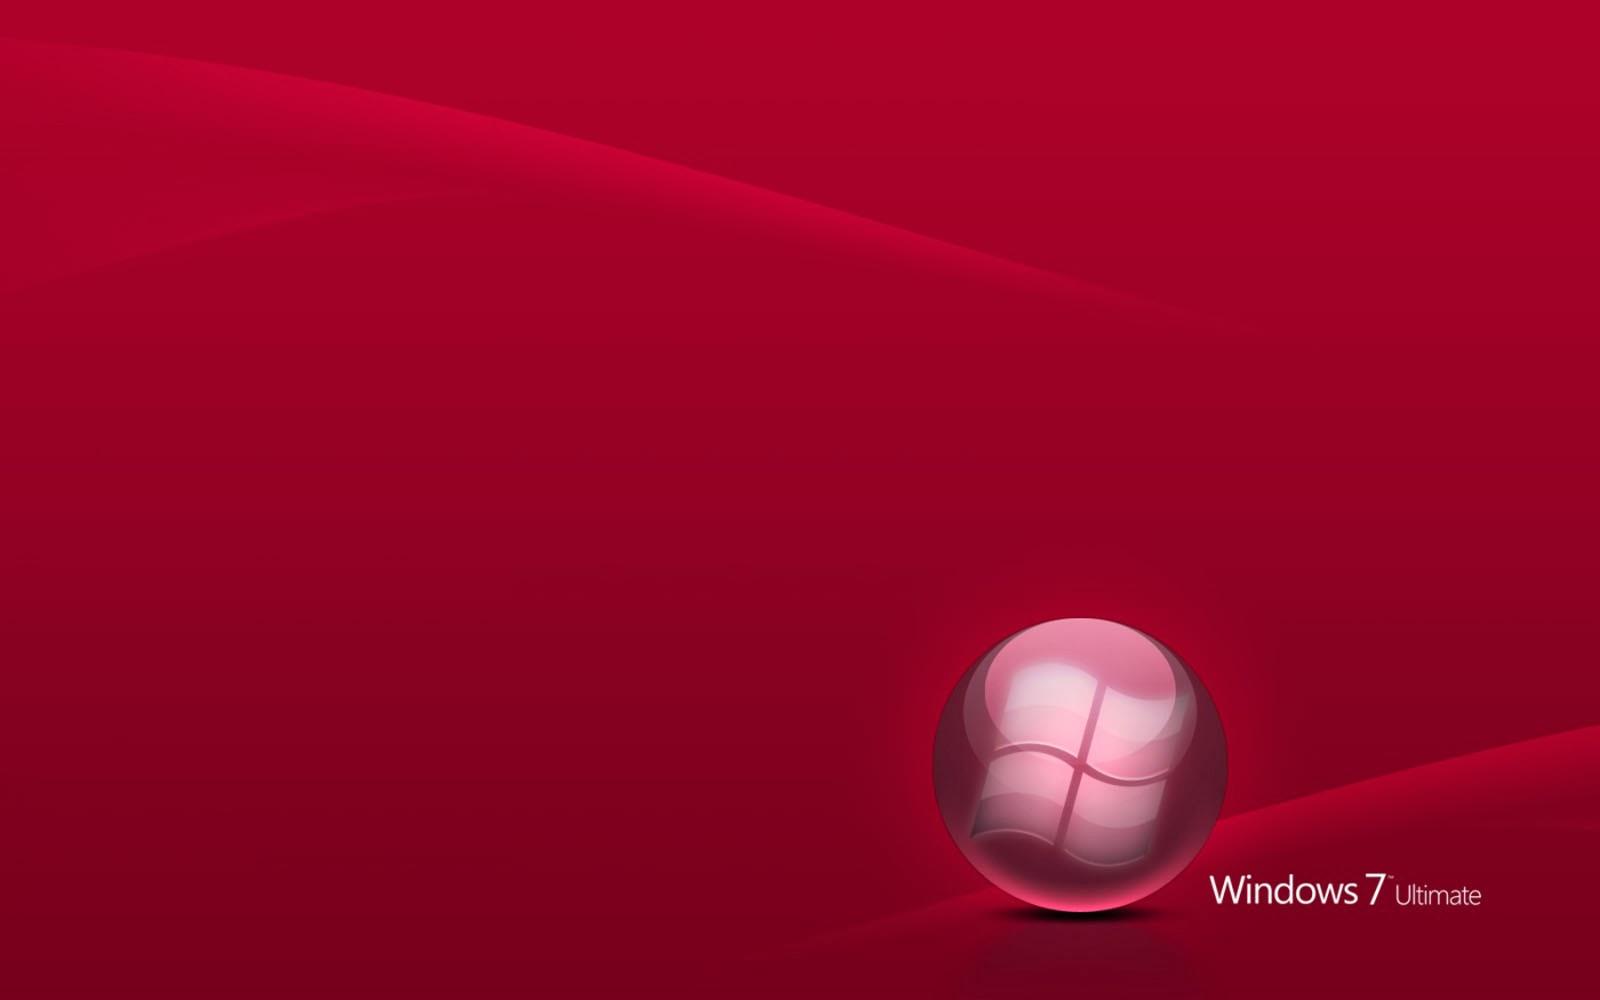 windows red wallpaper vista - photo #19